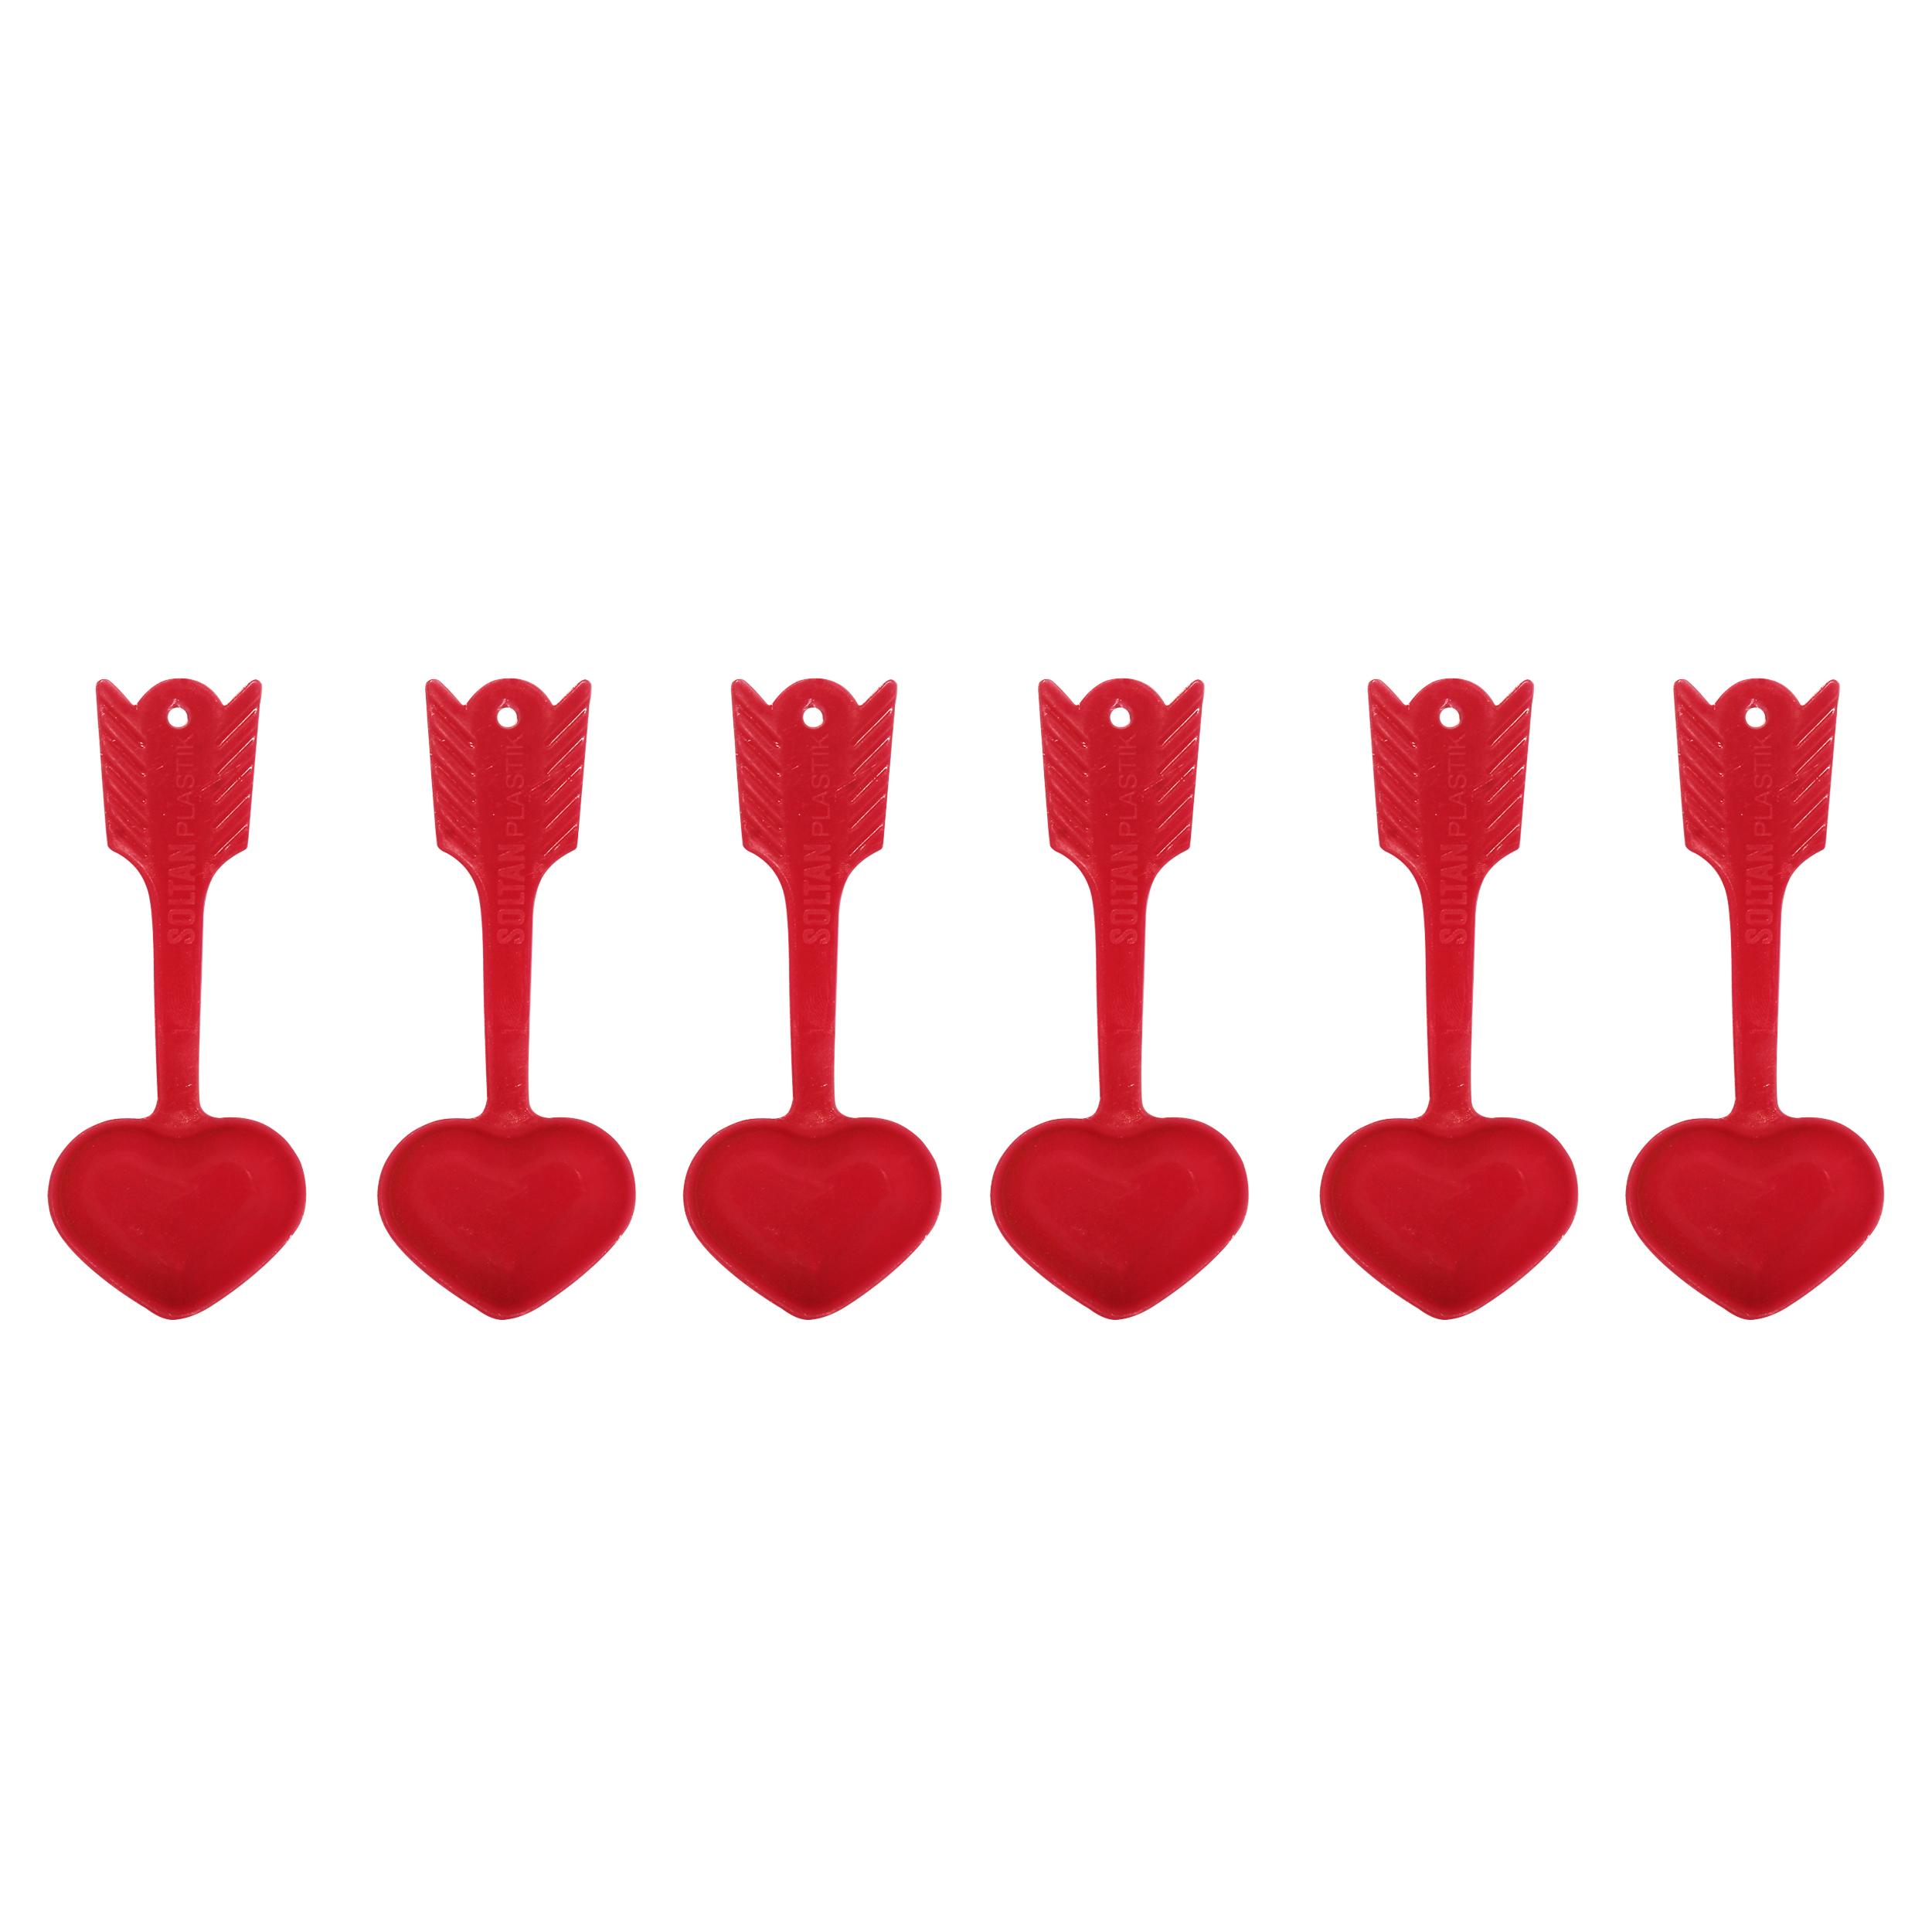 پیمانه ادویه مدل قلب کد 4145 بسته 6 عددی